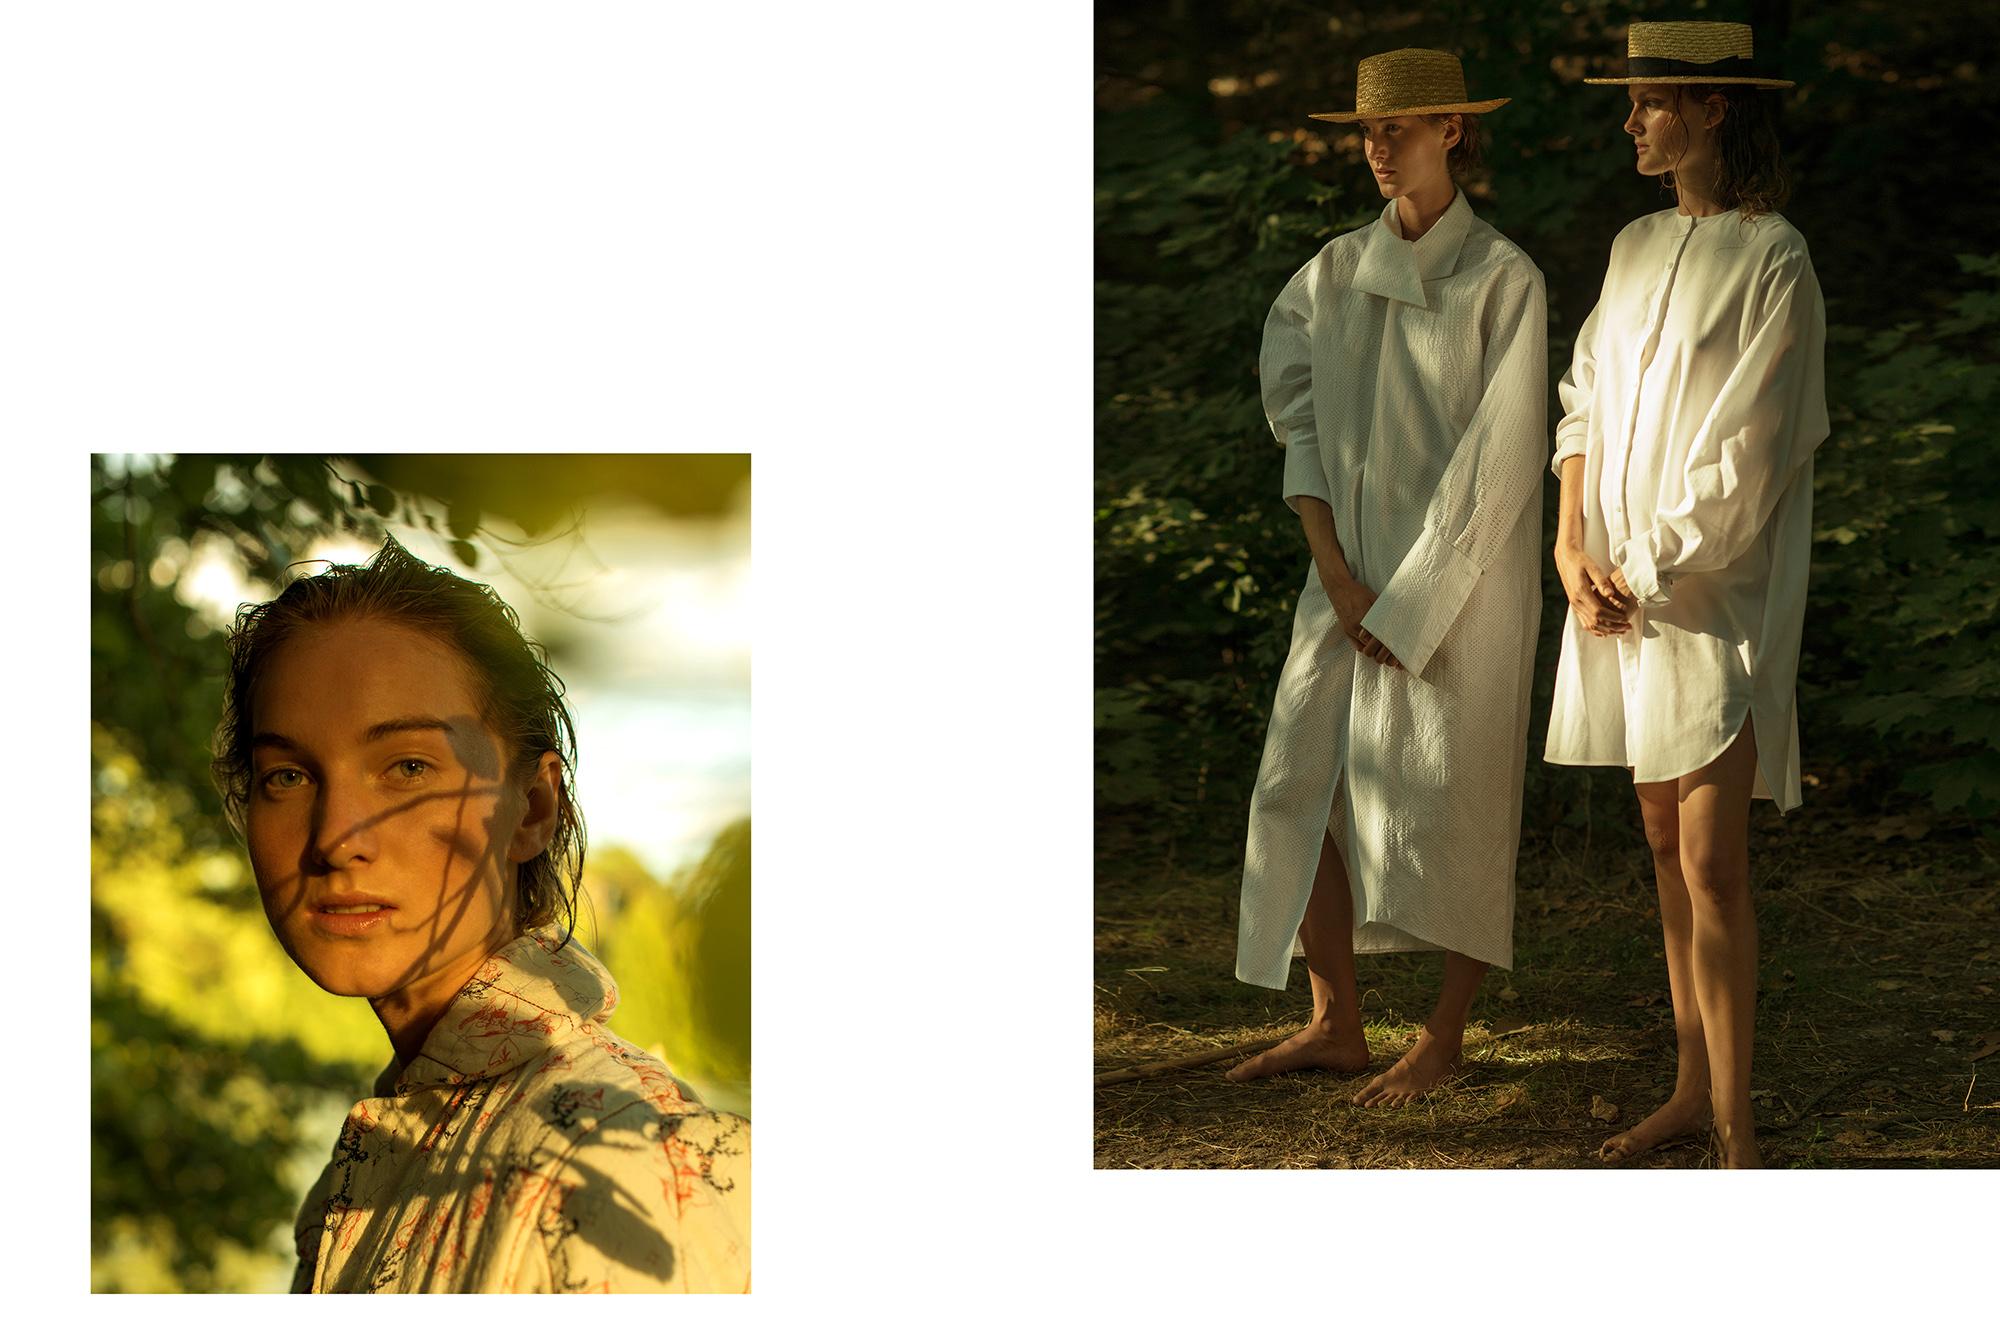 Anna+Rosa+Krau_Sustainable+Fashion_Seite_05_web.jpg